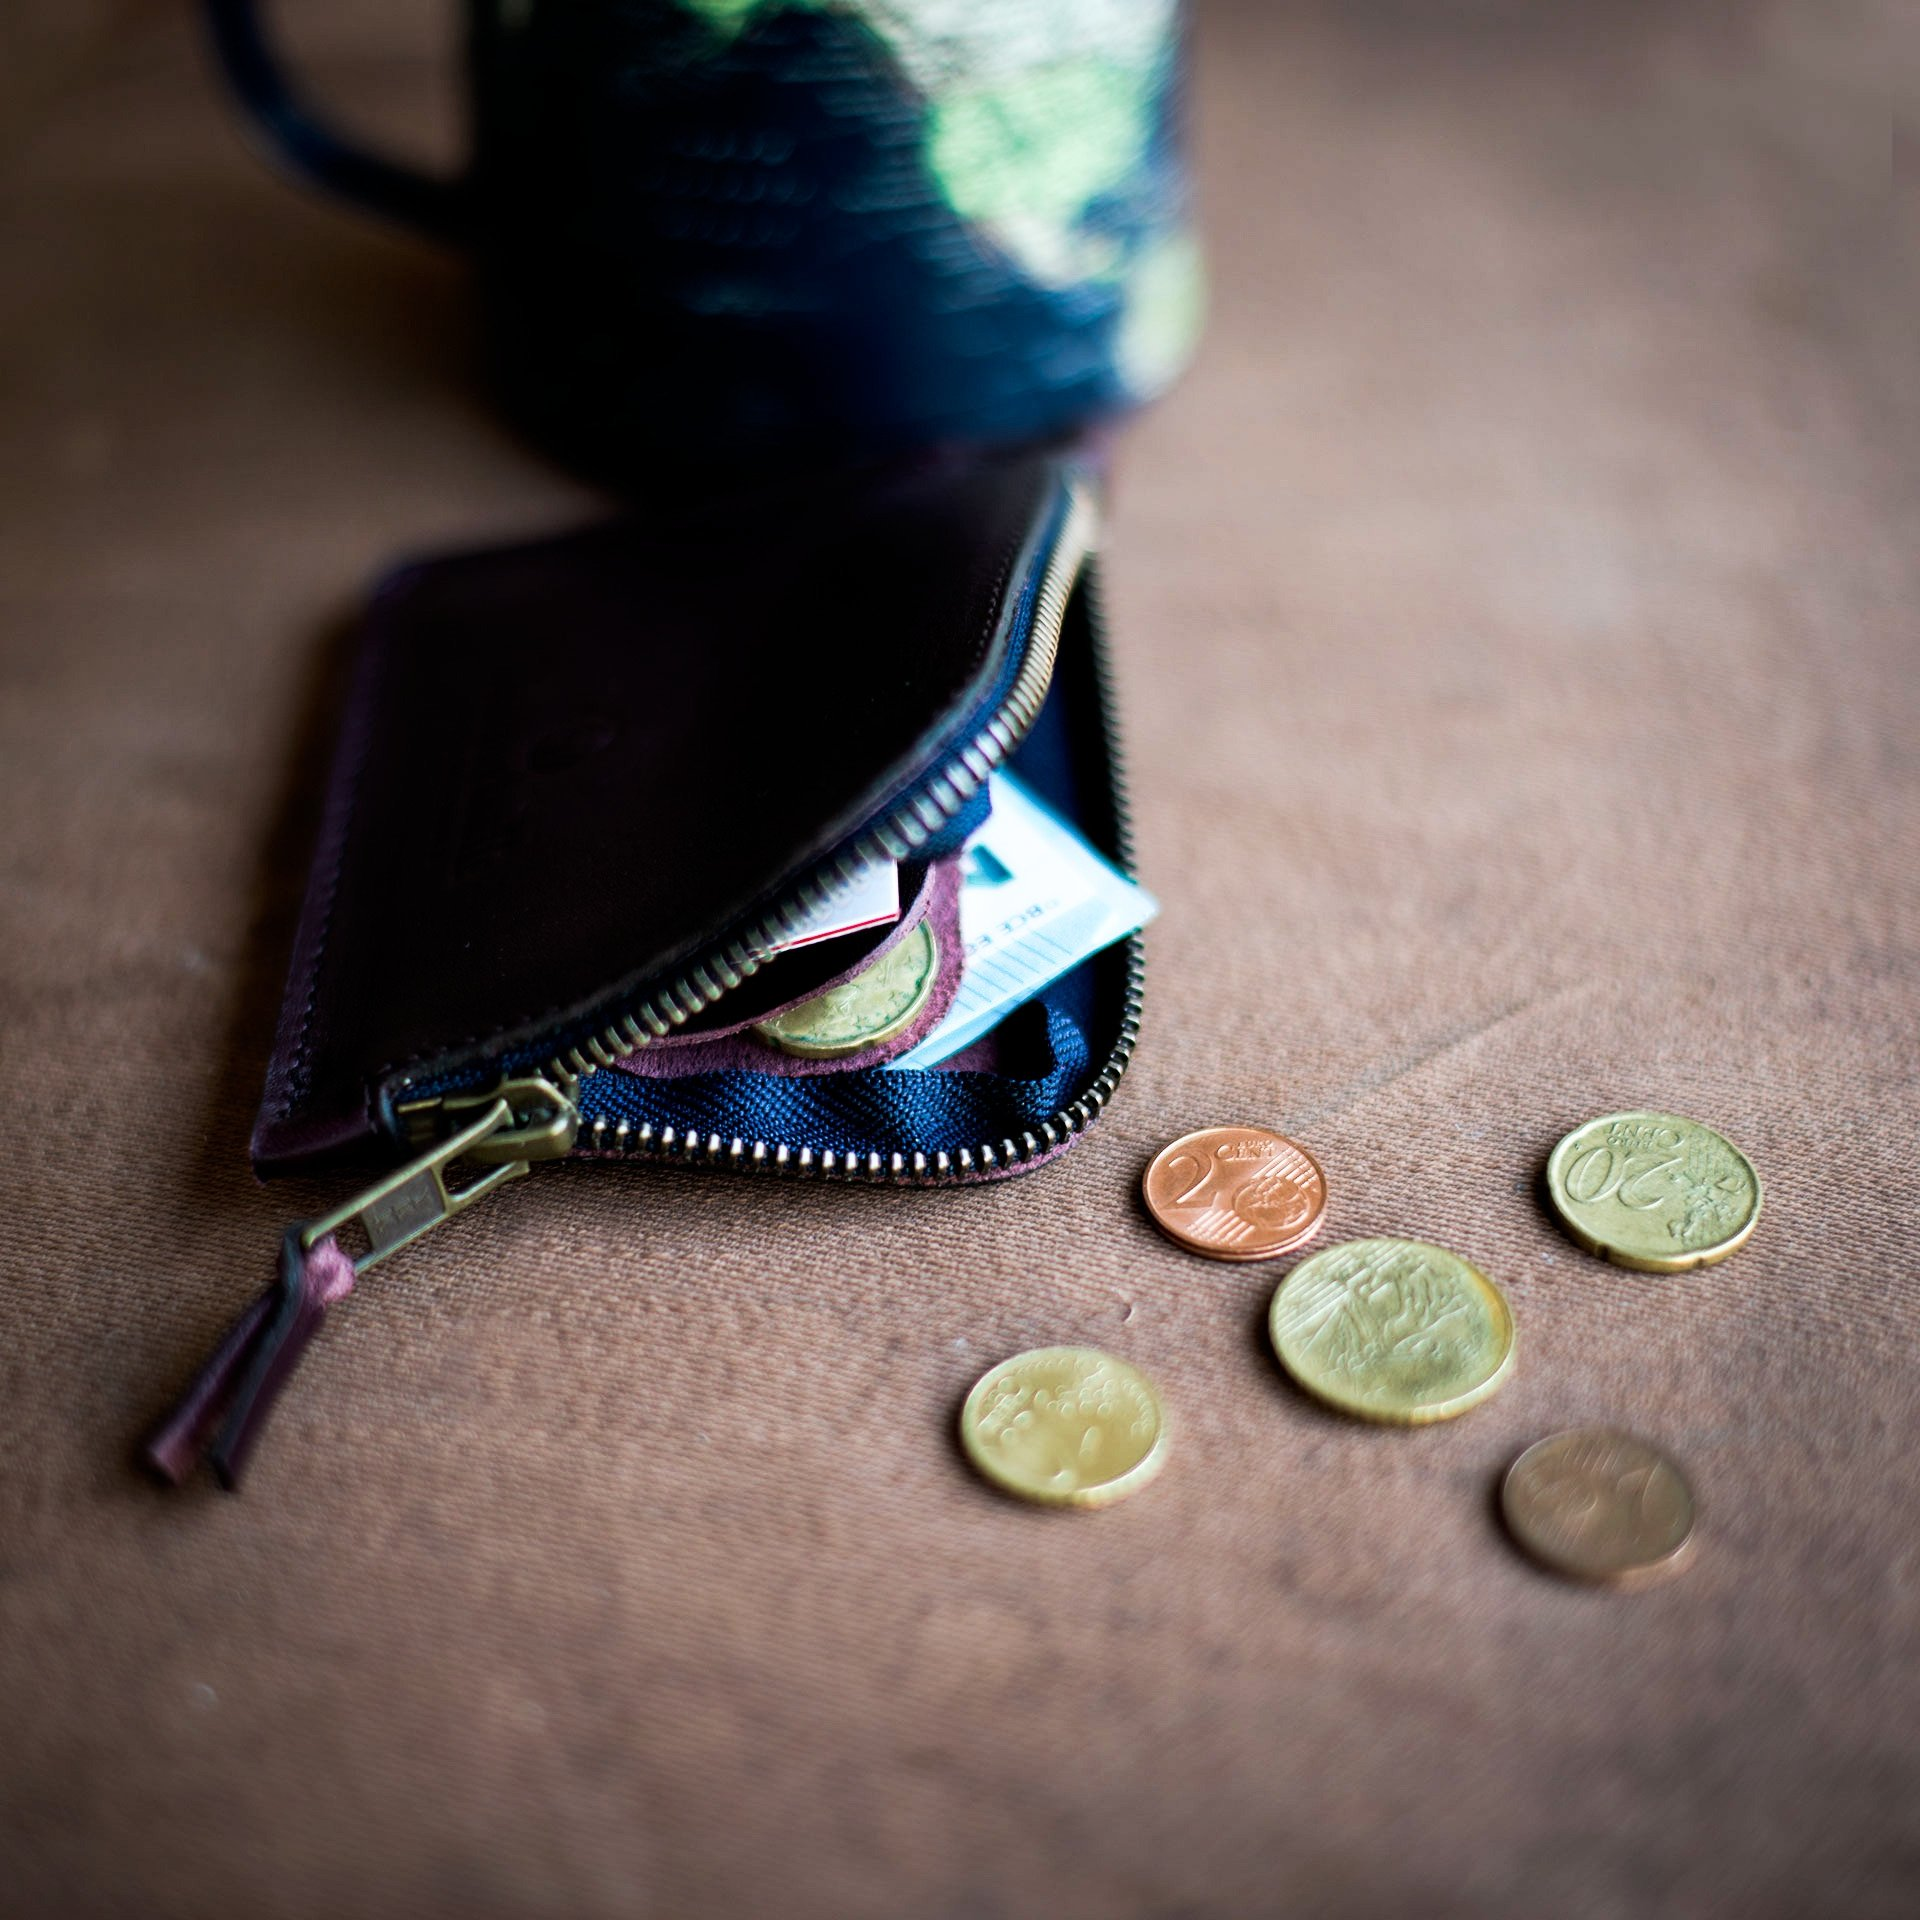 Porte monnaie zippé As / M - Tourbe (image n°5)